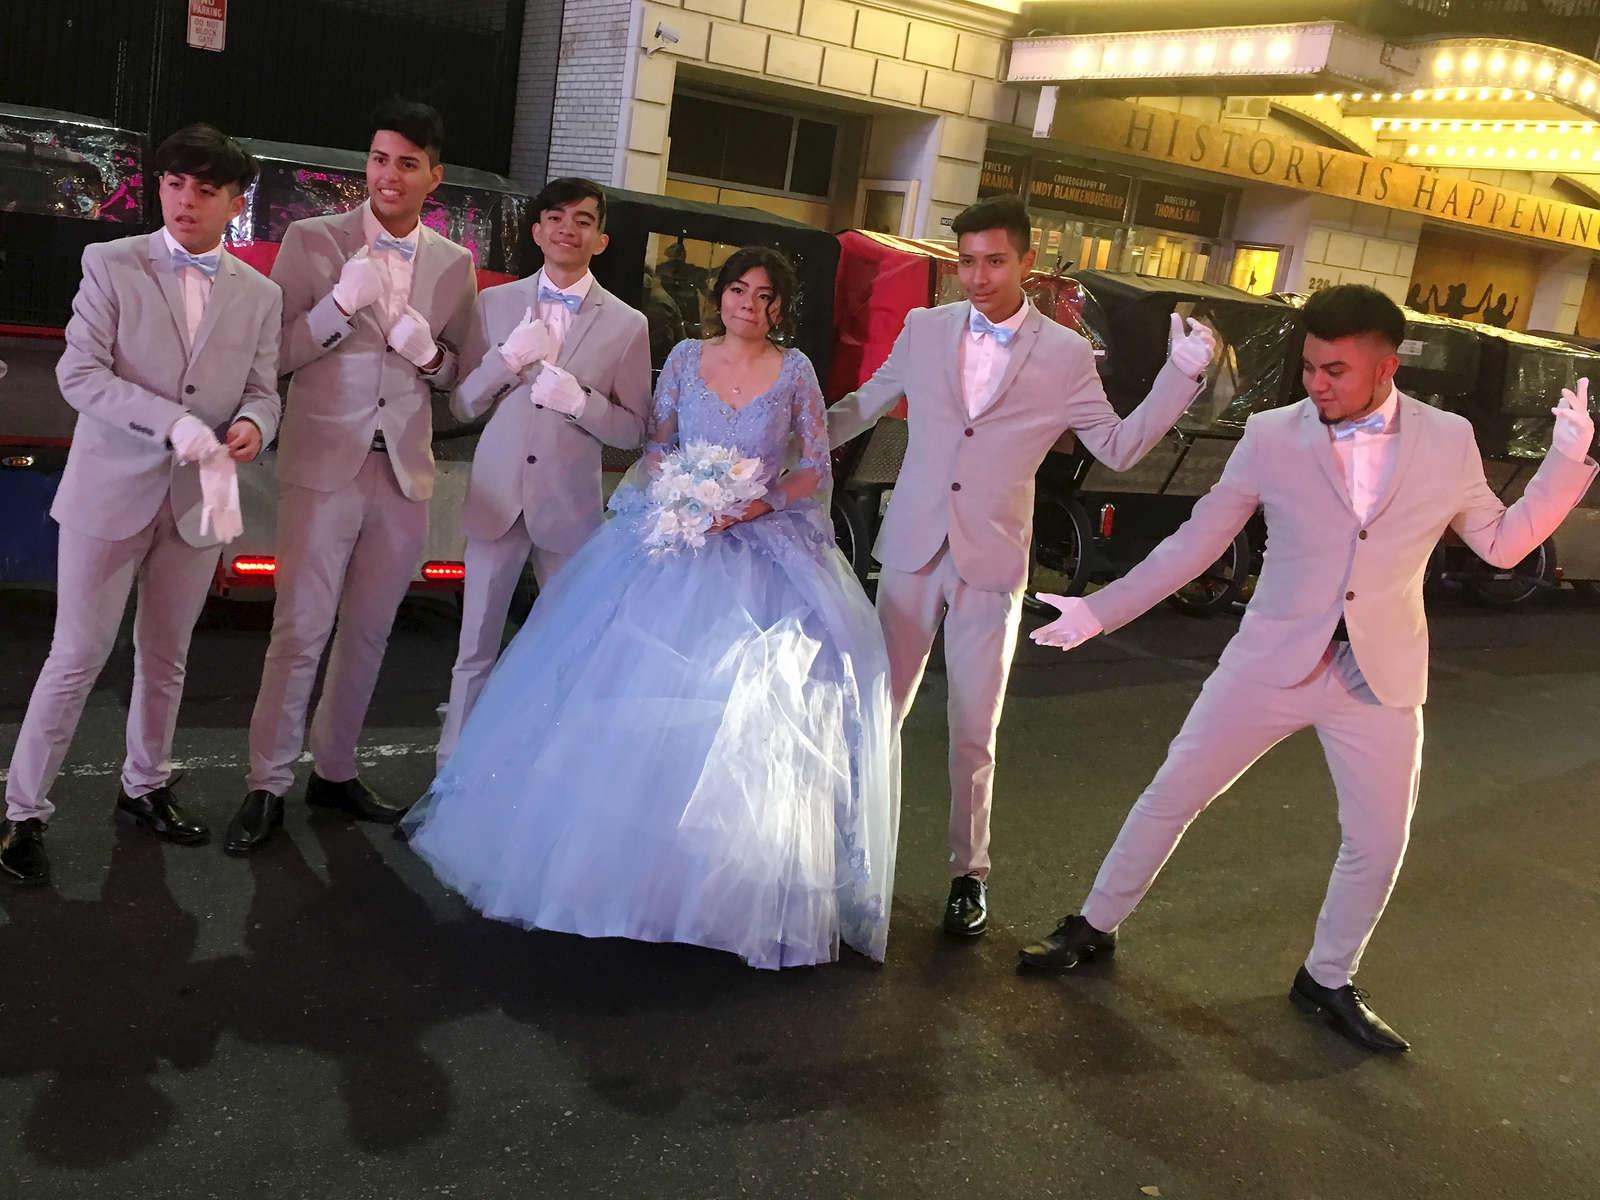 Wedding photo op on 47th St. NYC. Jon Chase photo